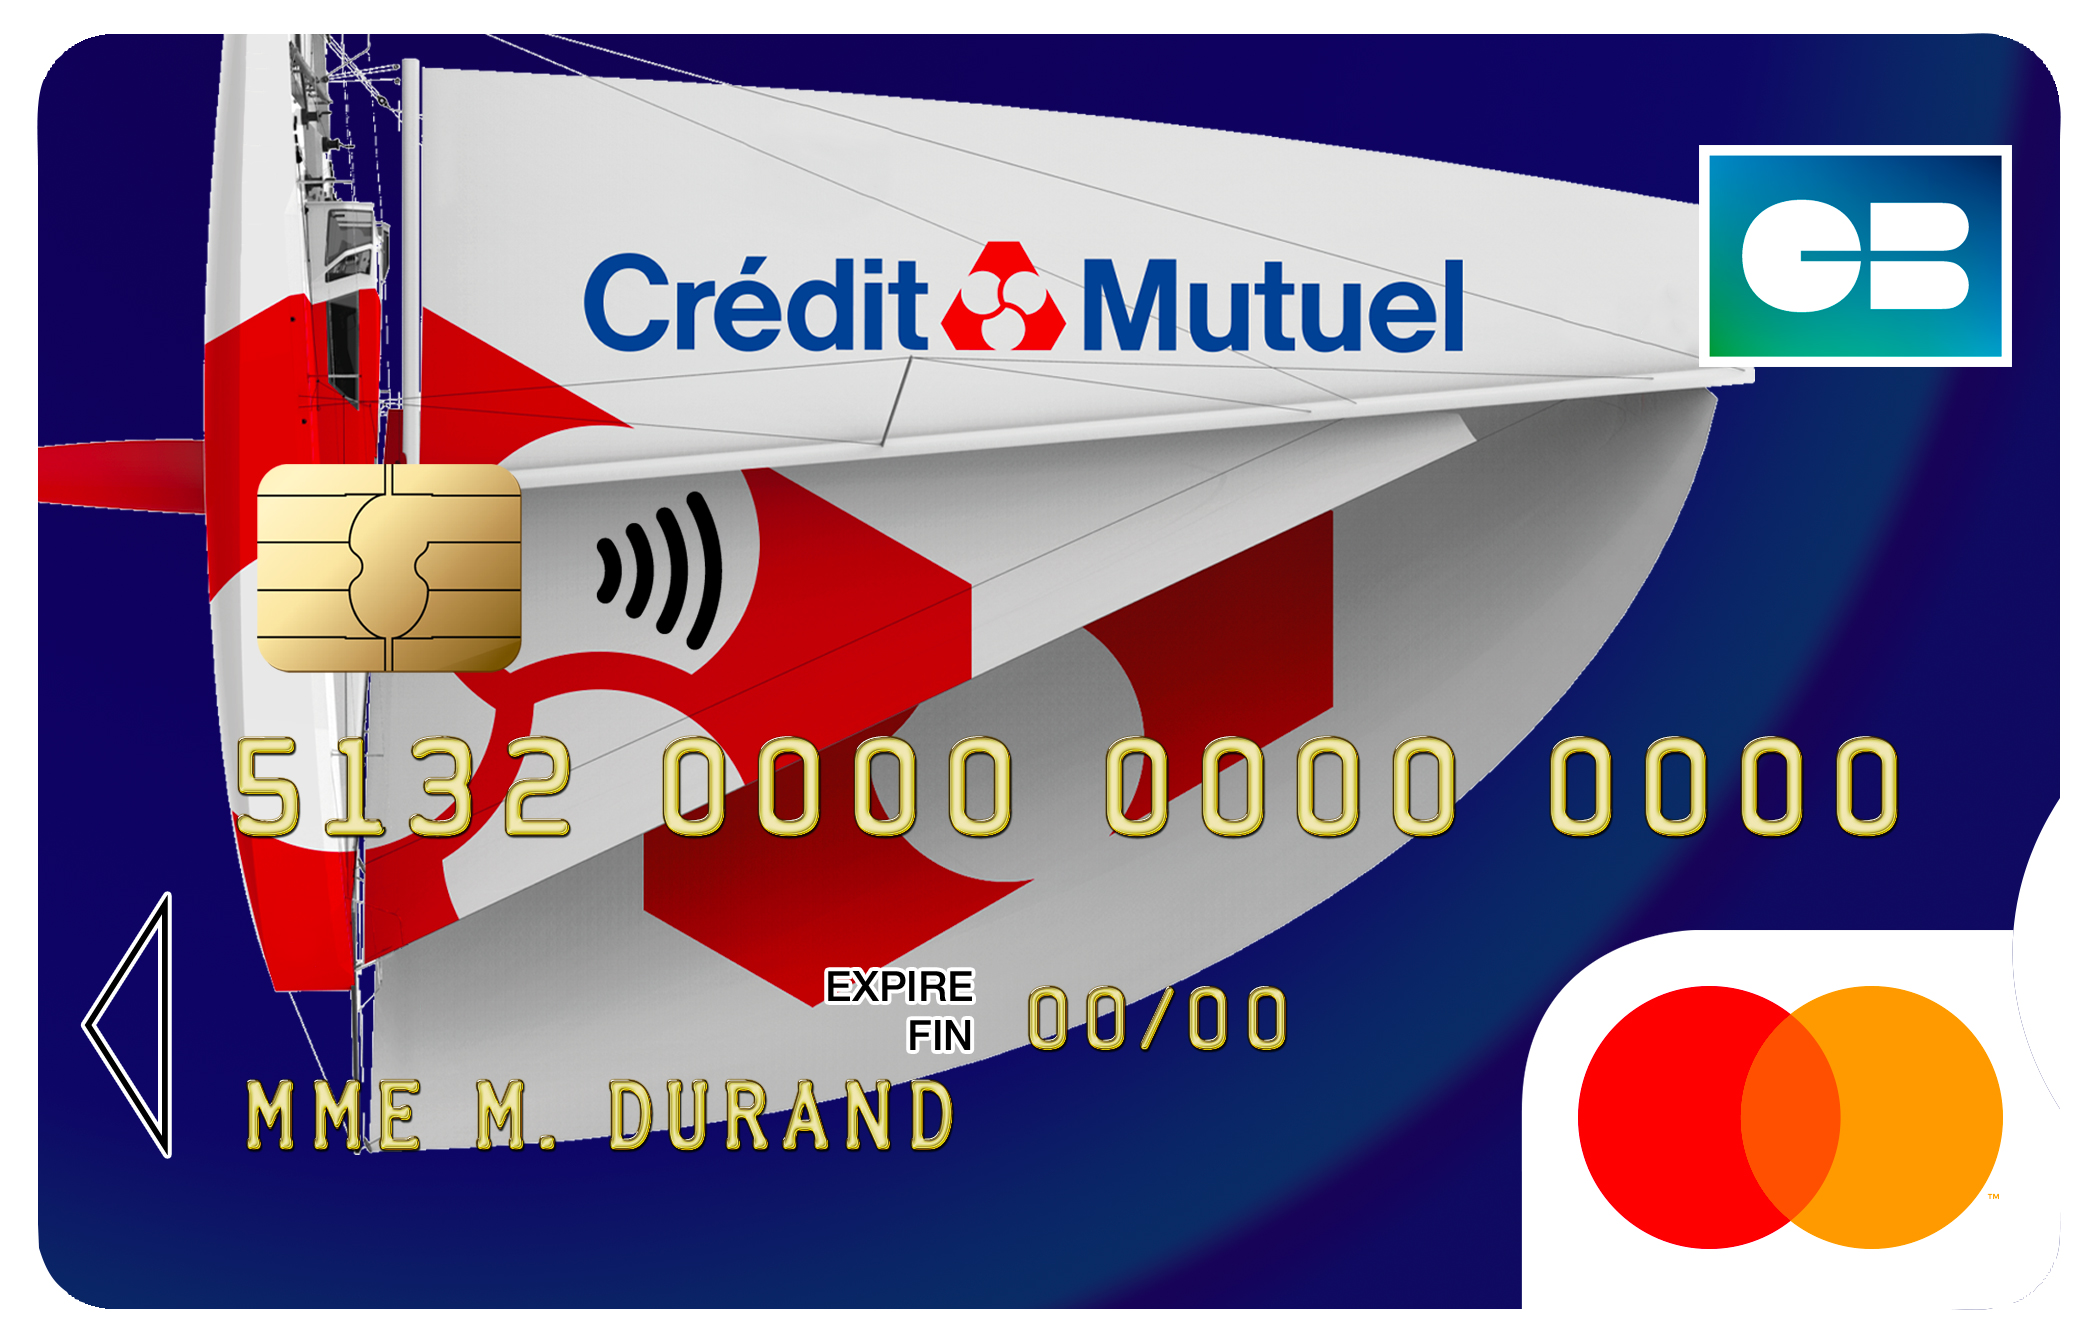 e-carte-bleu-credit-mutuelle